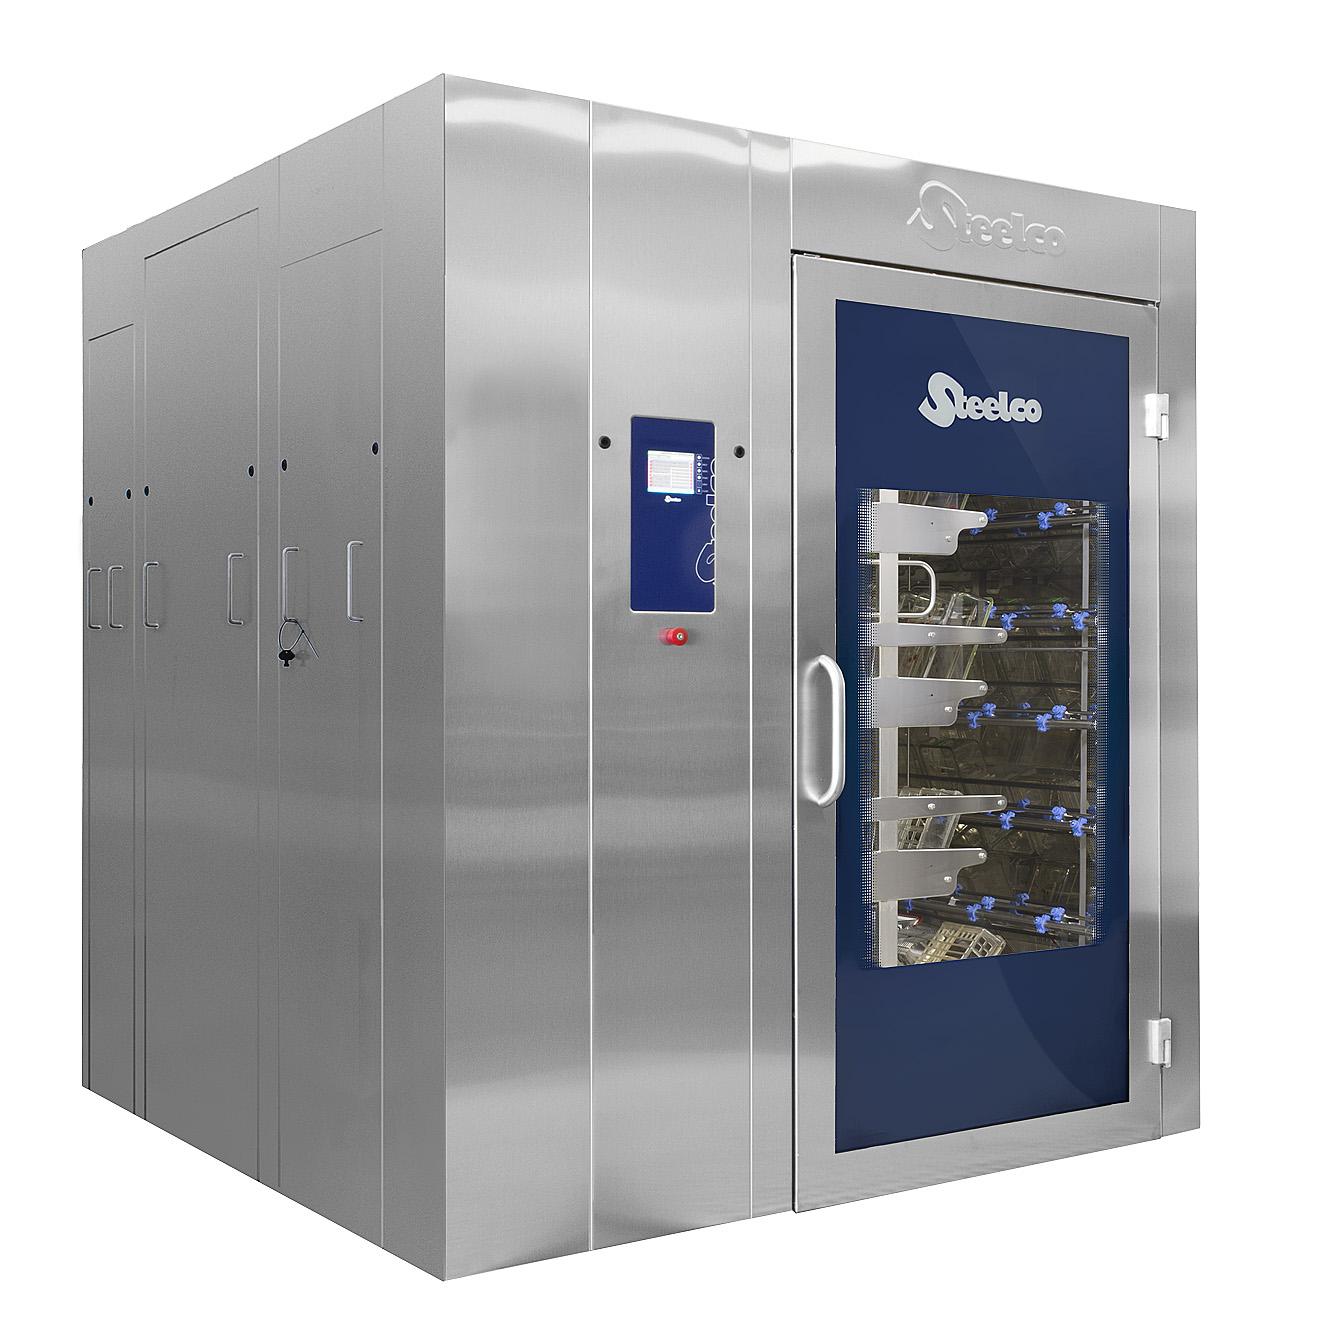 Steelco AC 7000